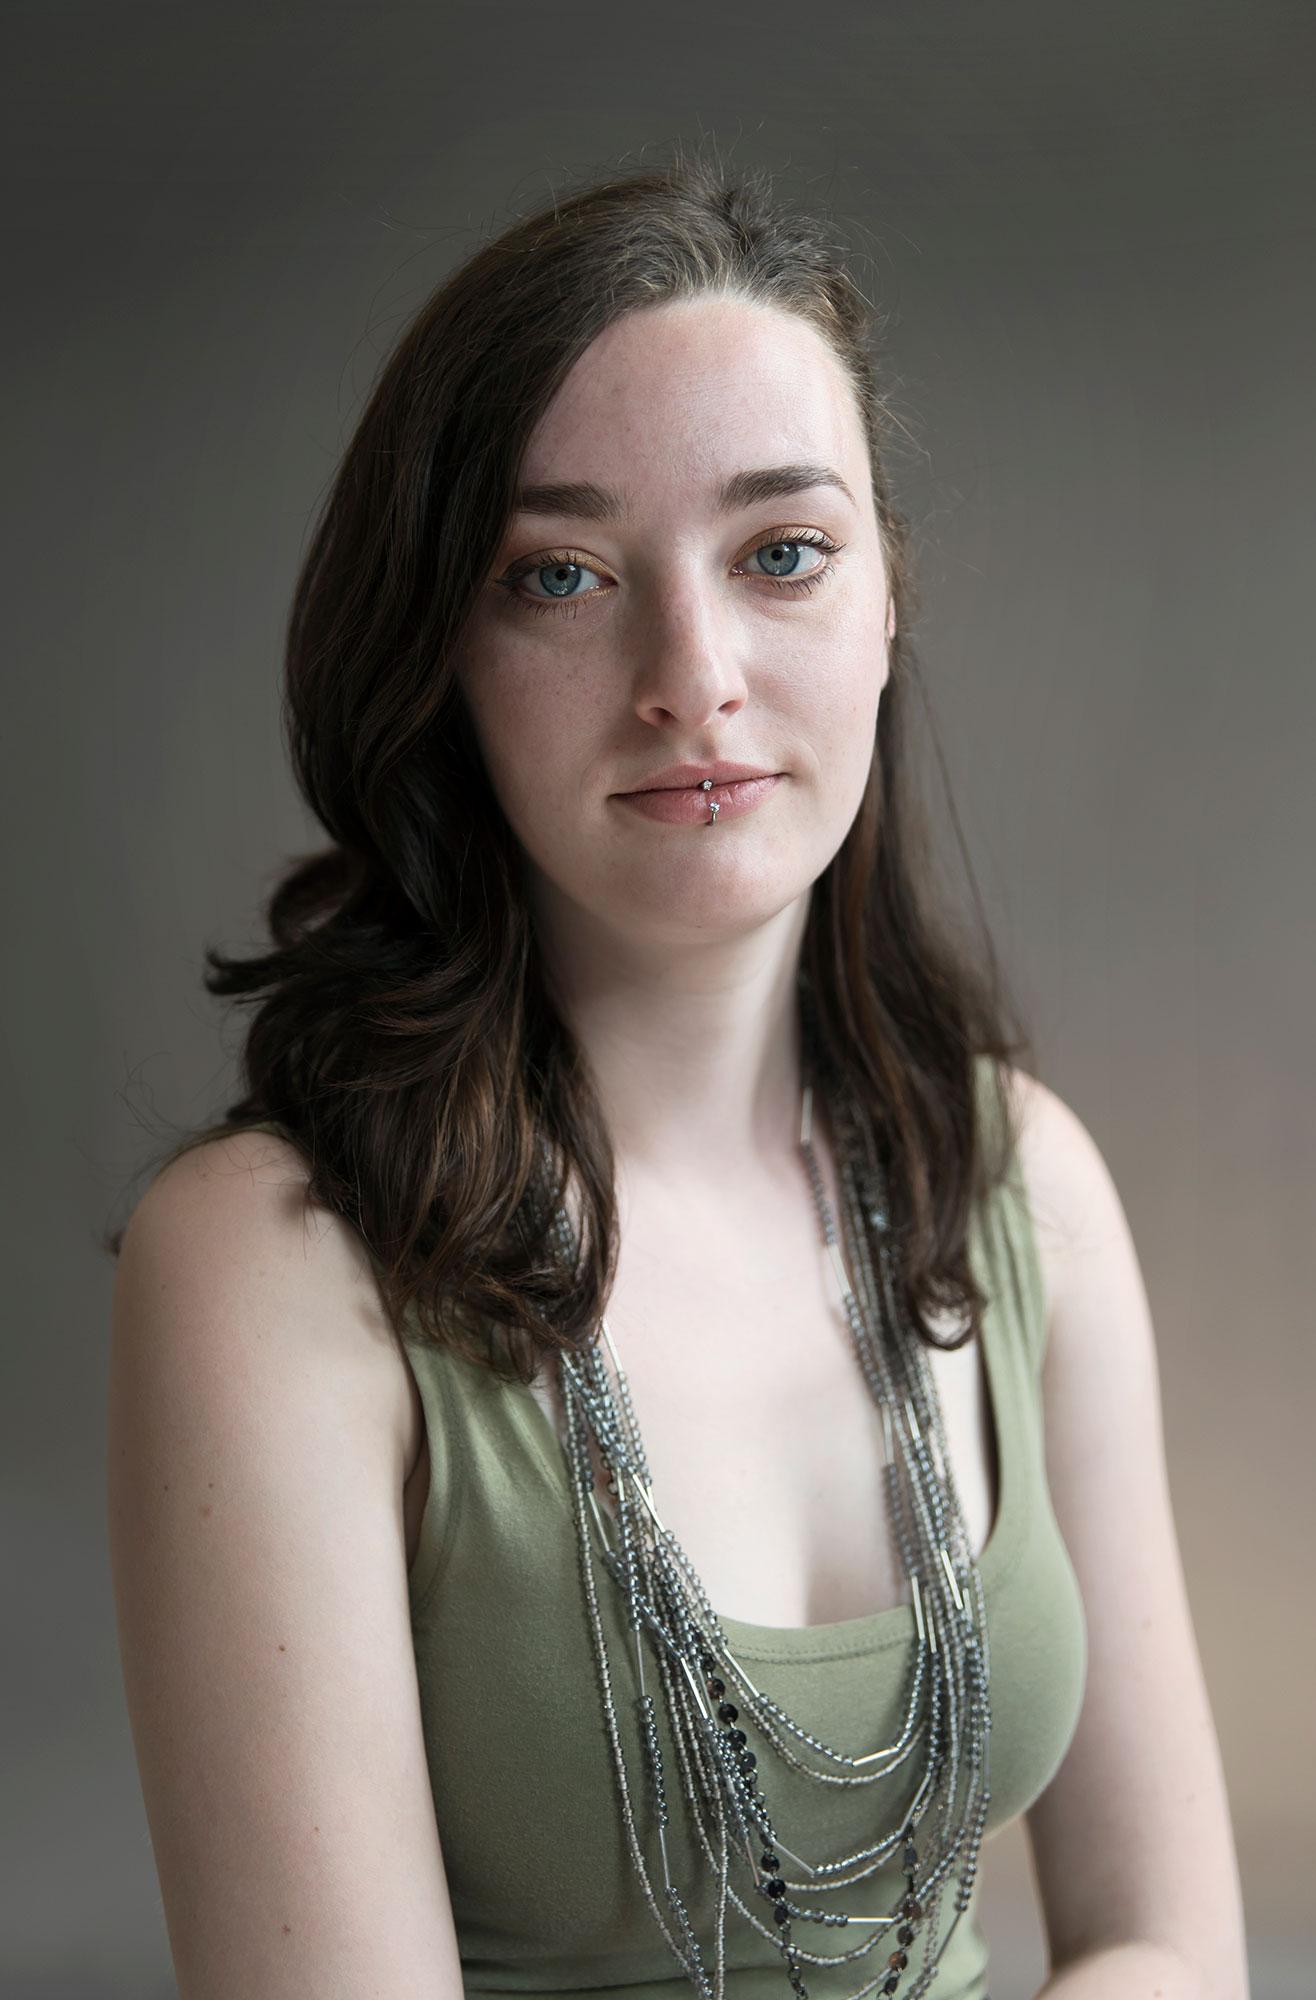 Faces Model Laura